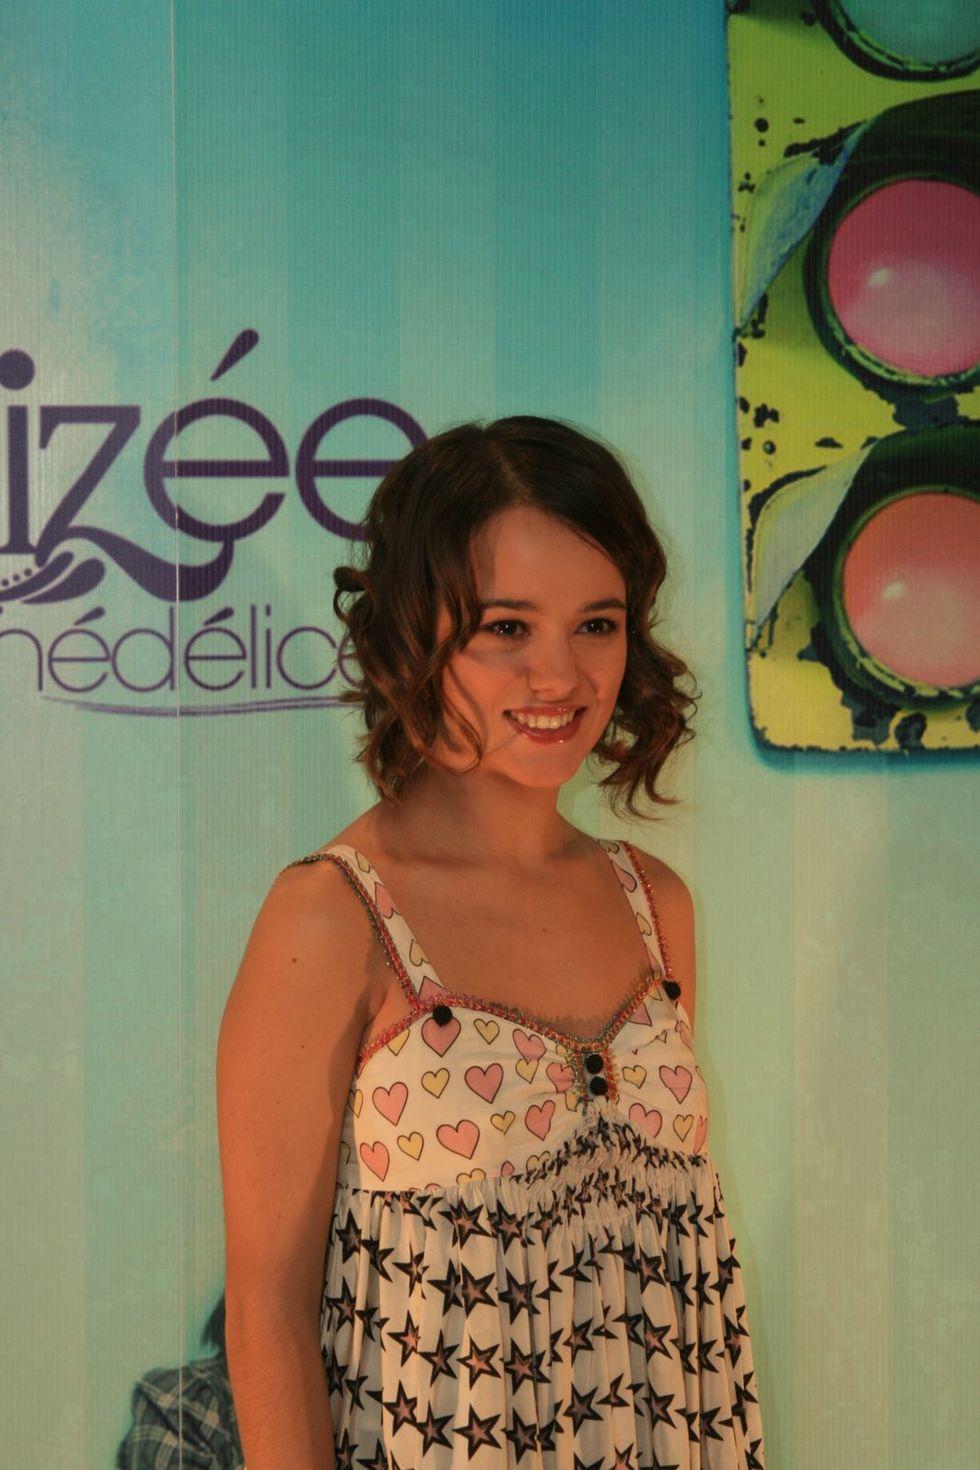 alizee-psychedelices-album-presentation-in-mexico-city-01